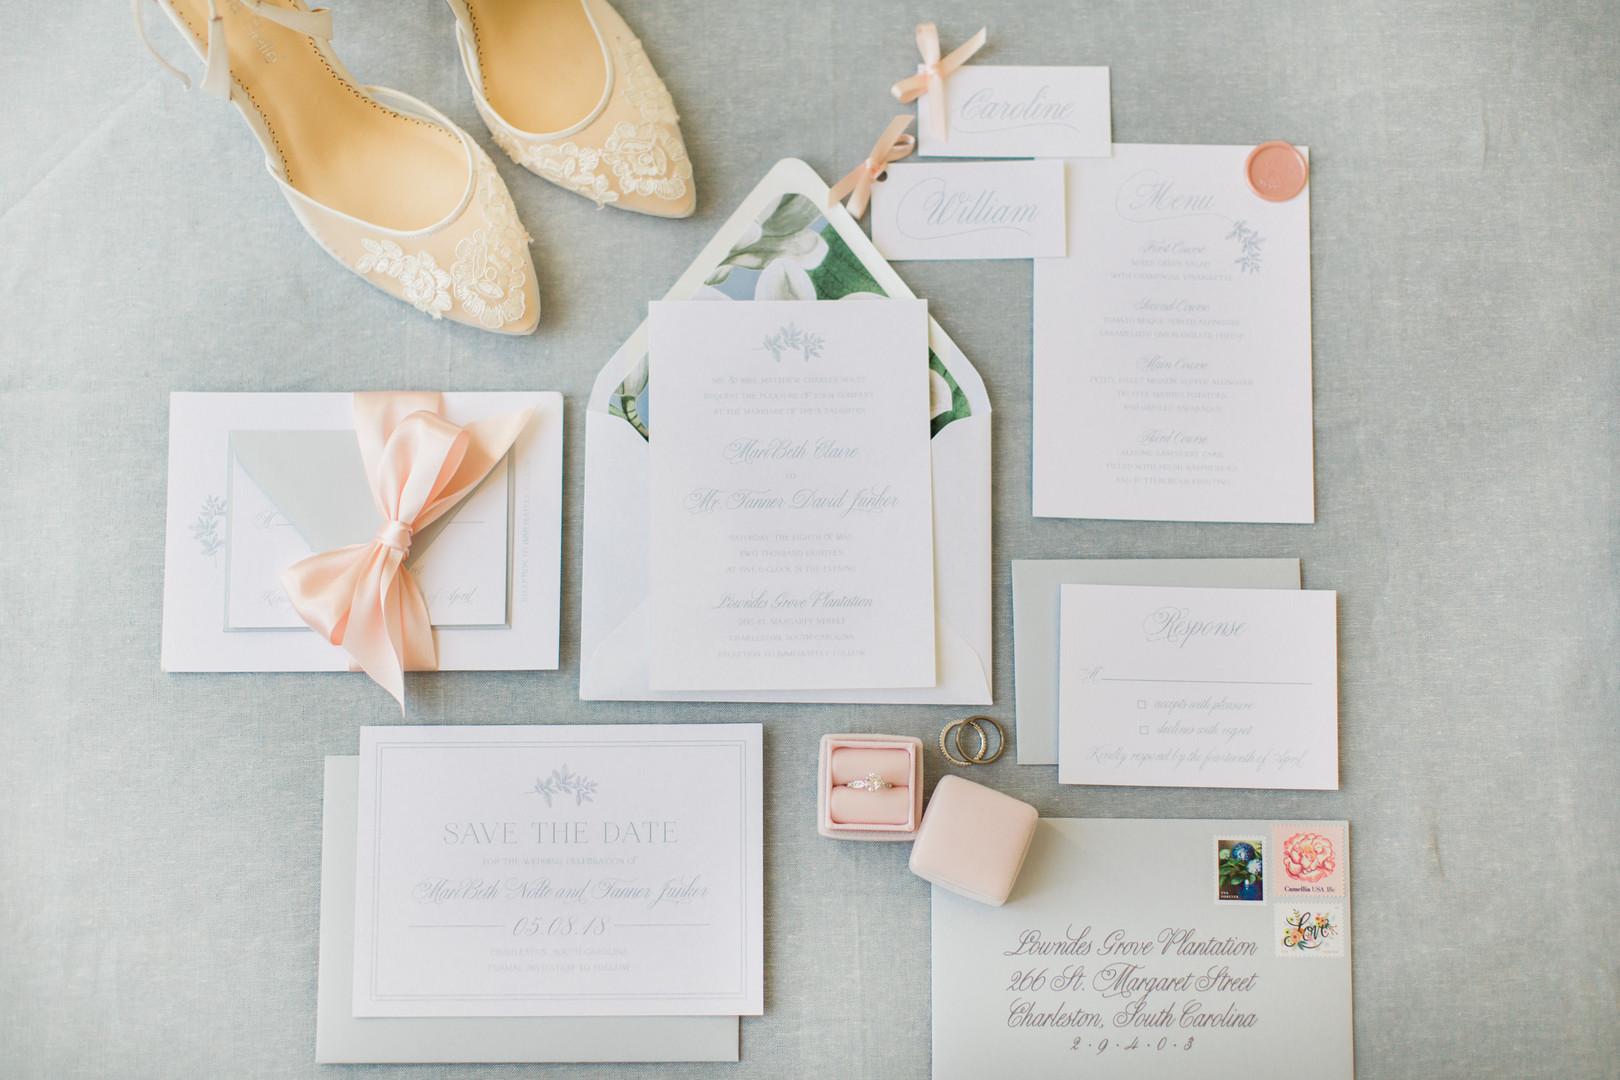 lowndes-grove-plantation-wedding-23.jpg